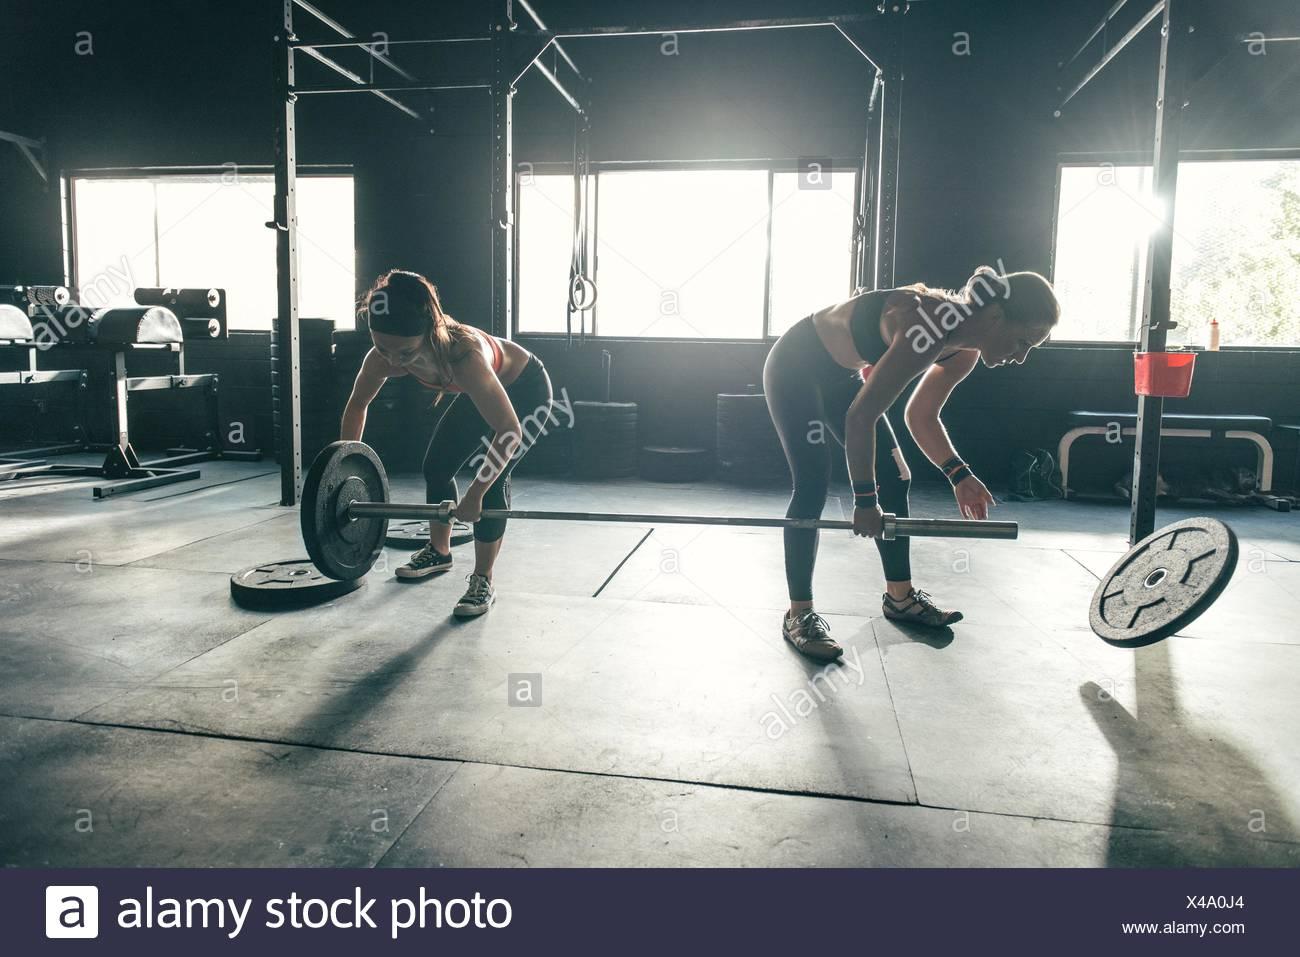 Women preparing barbell in gym - Stock Image